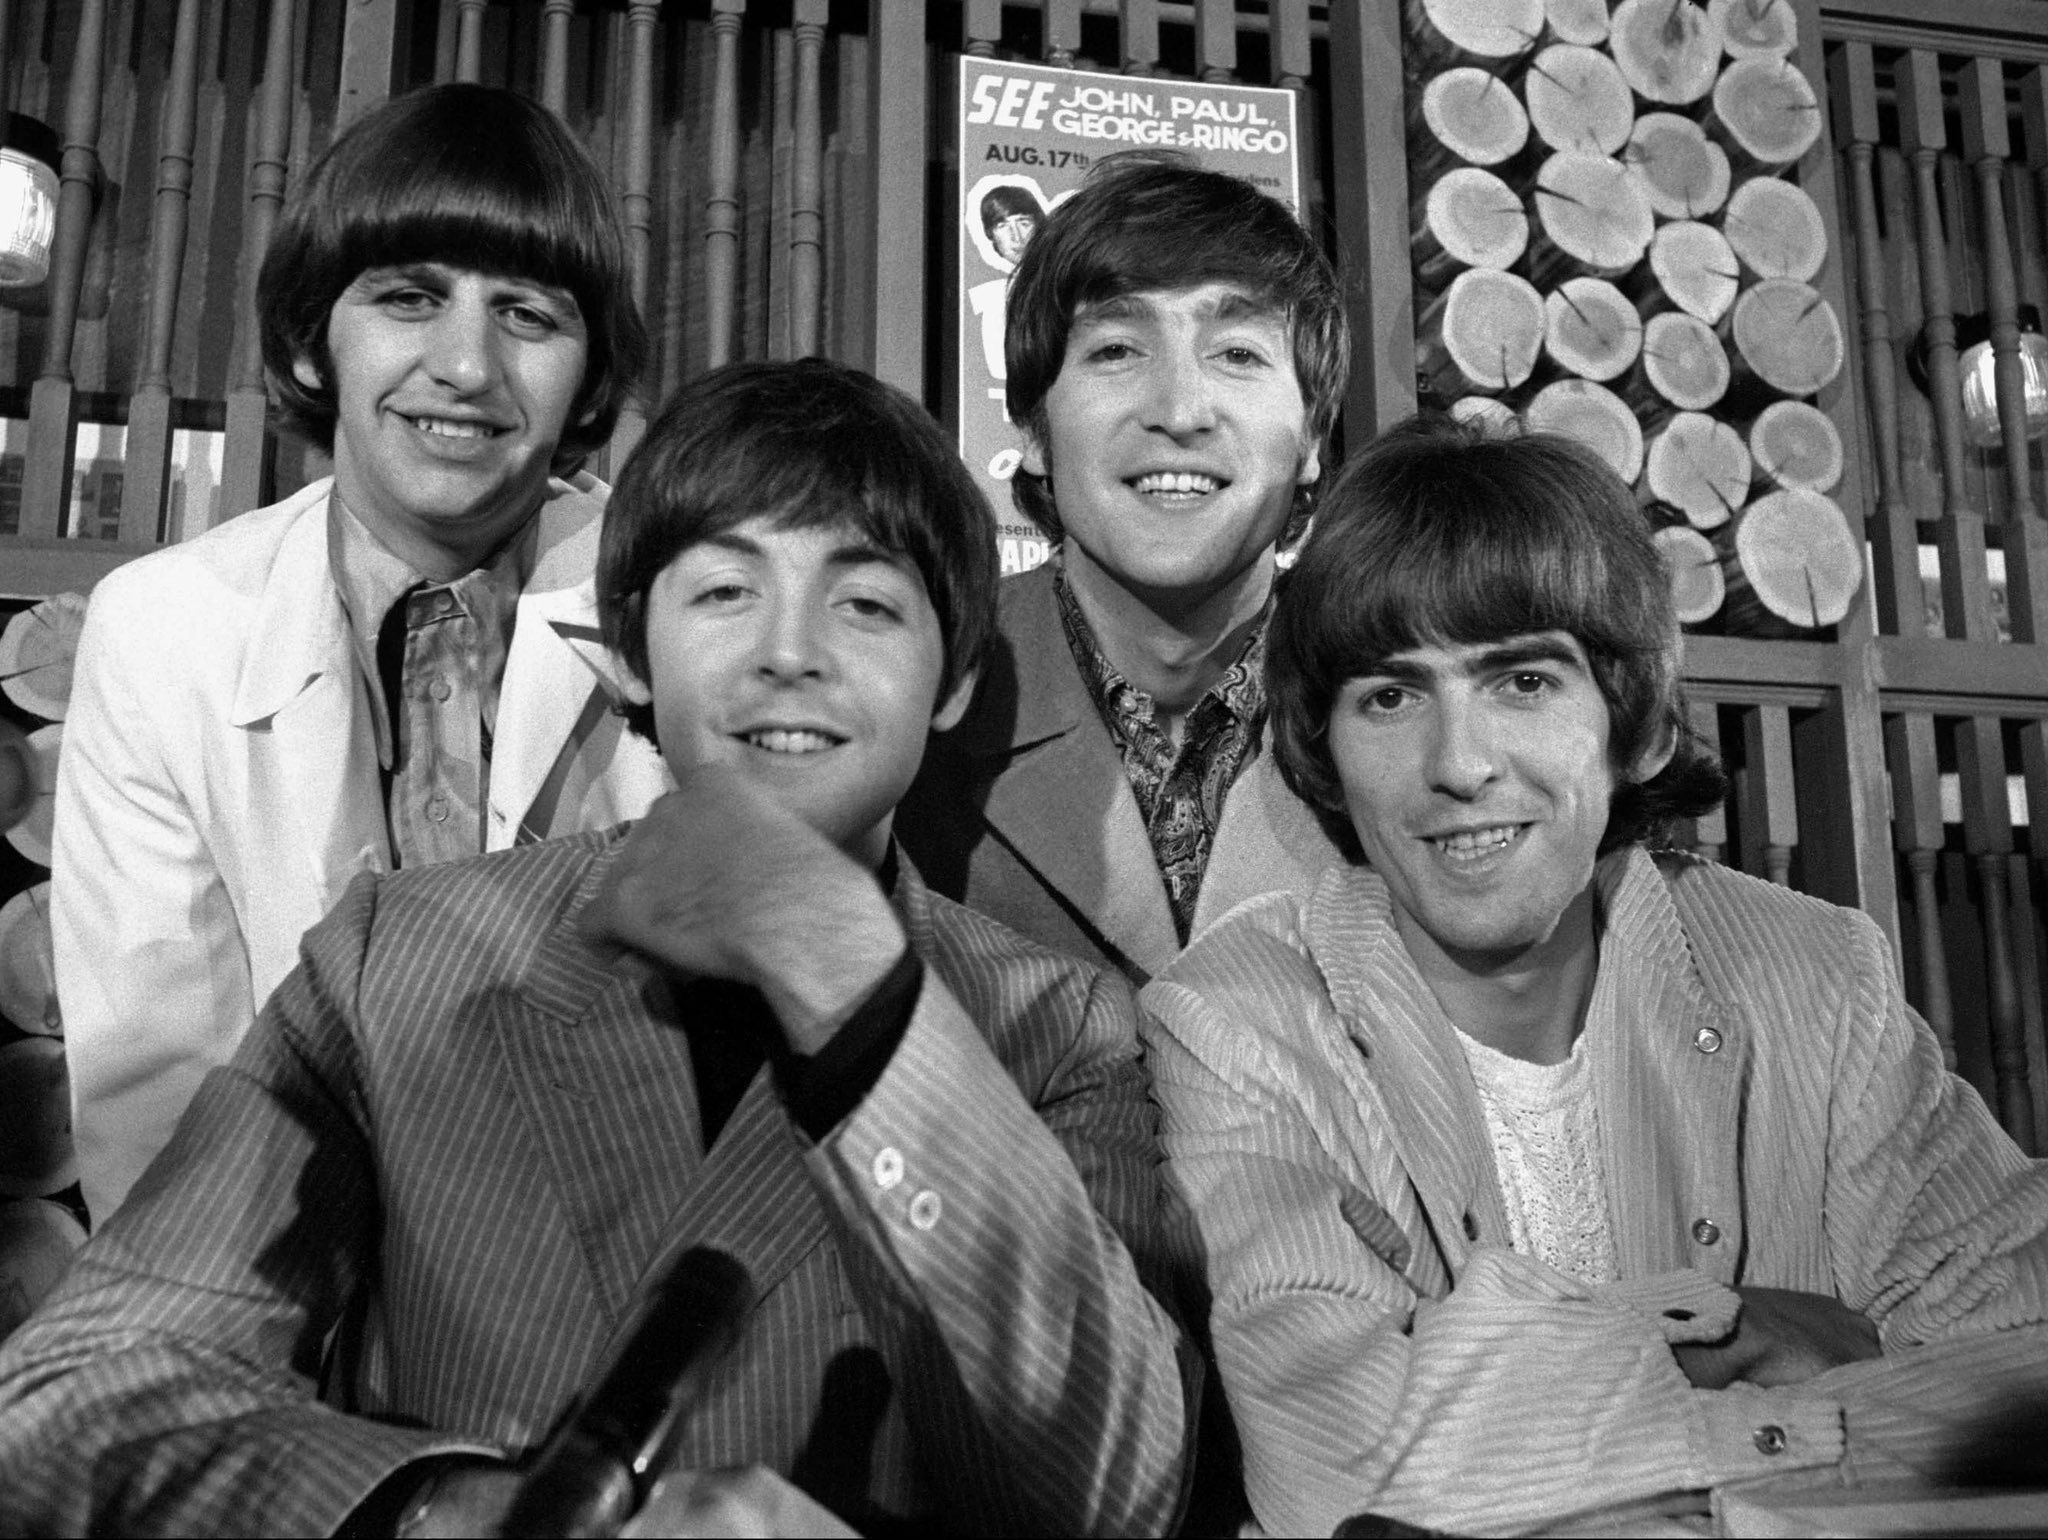 The Beatles, 1966 | Beatles rare, The beatles, Beatles pictures